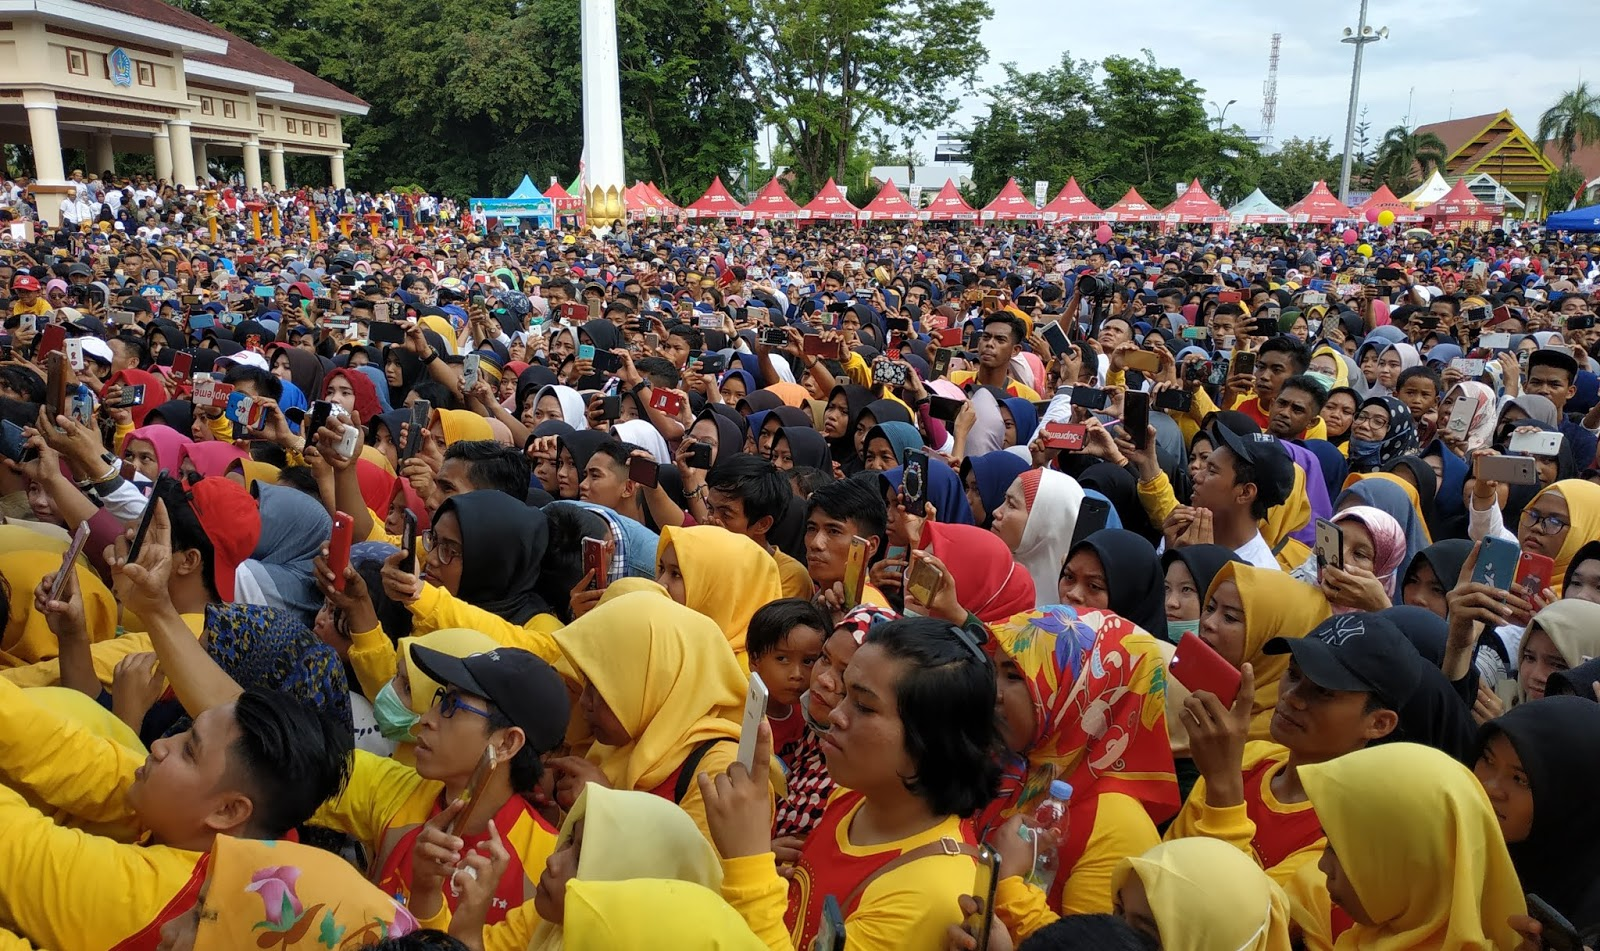 Belasan Ribu Masyarakat Ikuti Giat Milenial Road Safety Festival Polres Bone